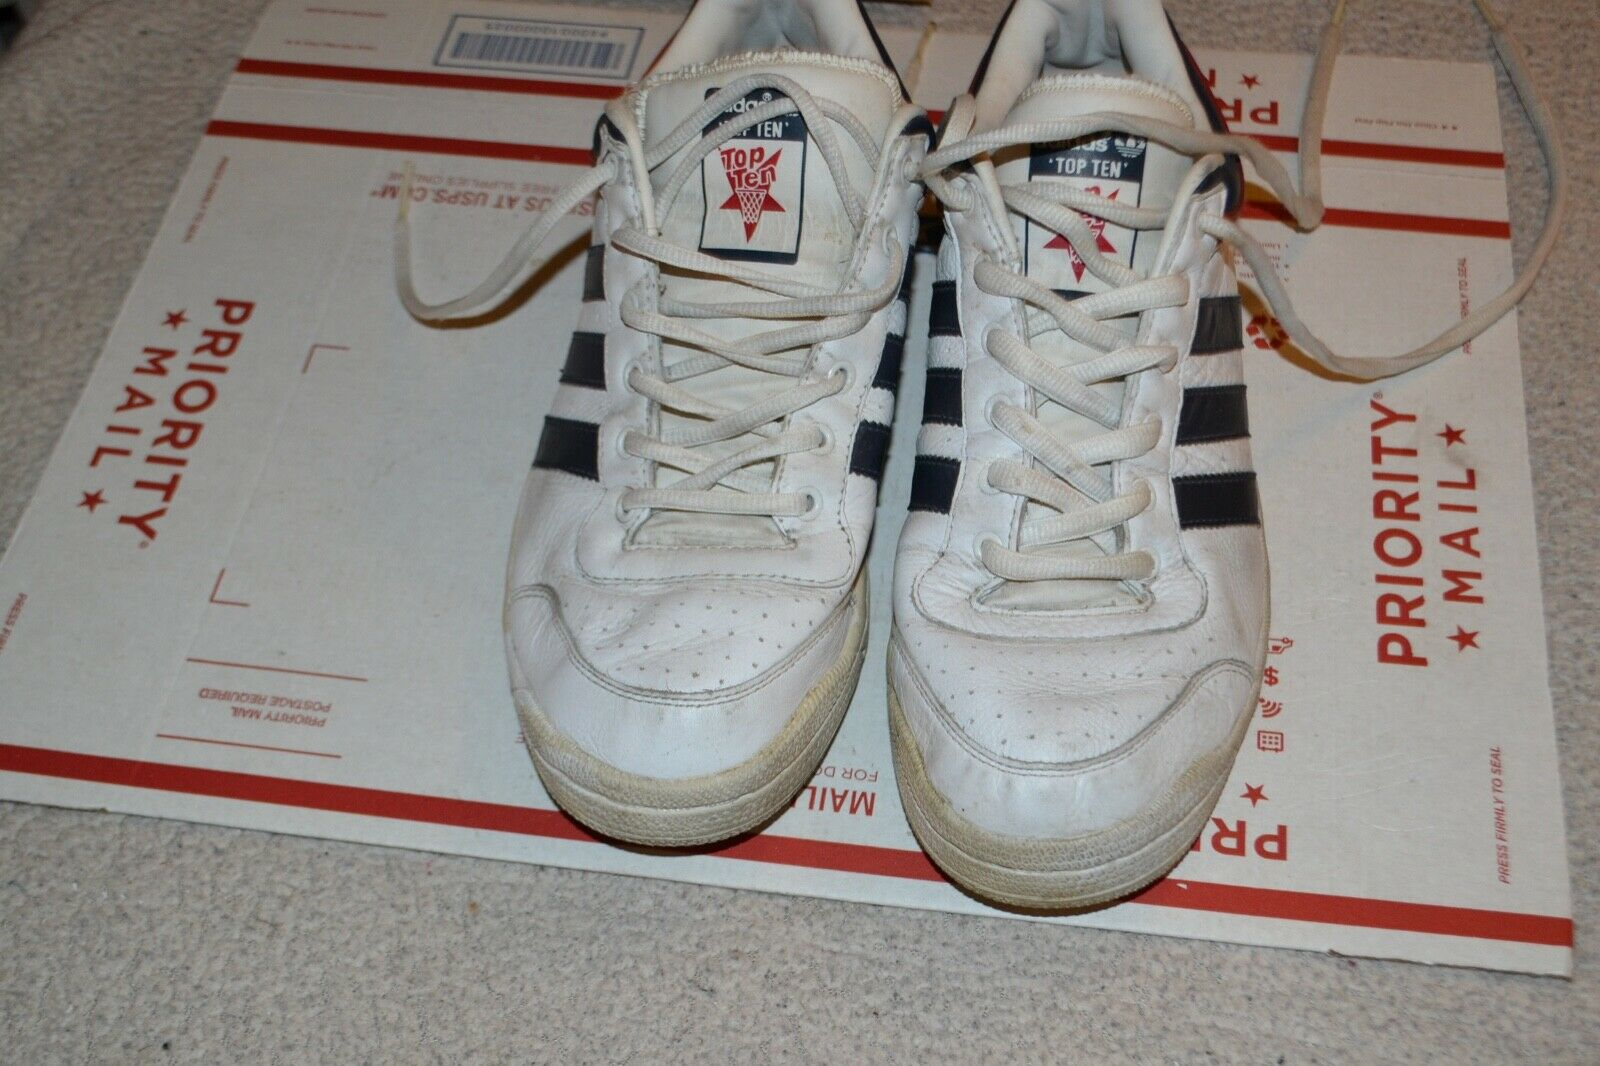 Adidas Originals Top Ten Retro Low  Red White bluee  Size 10.5